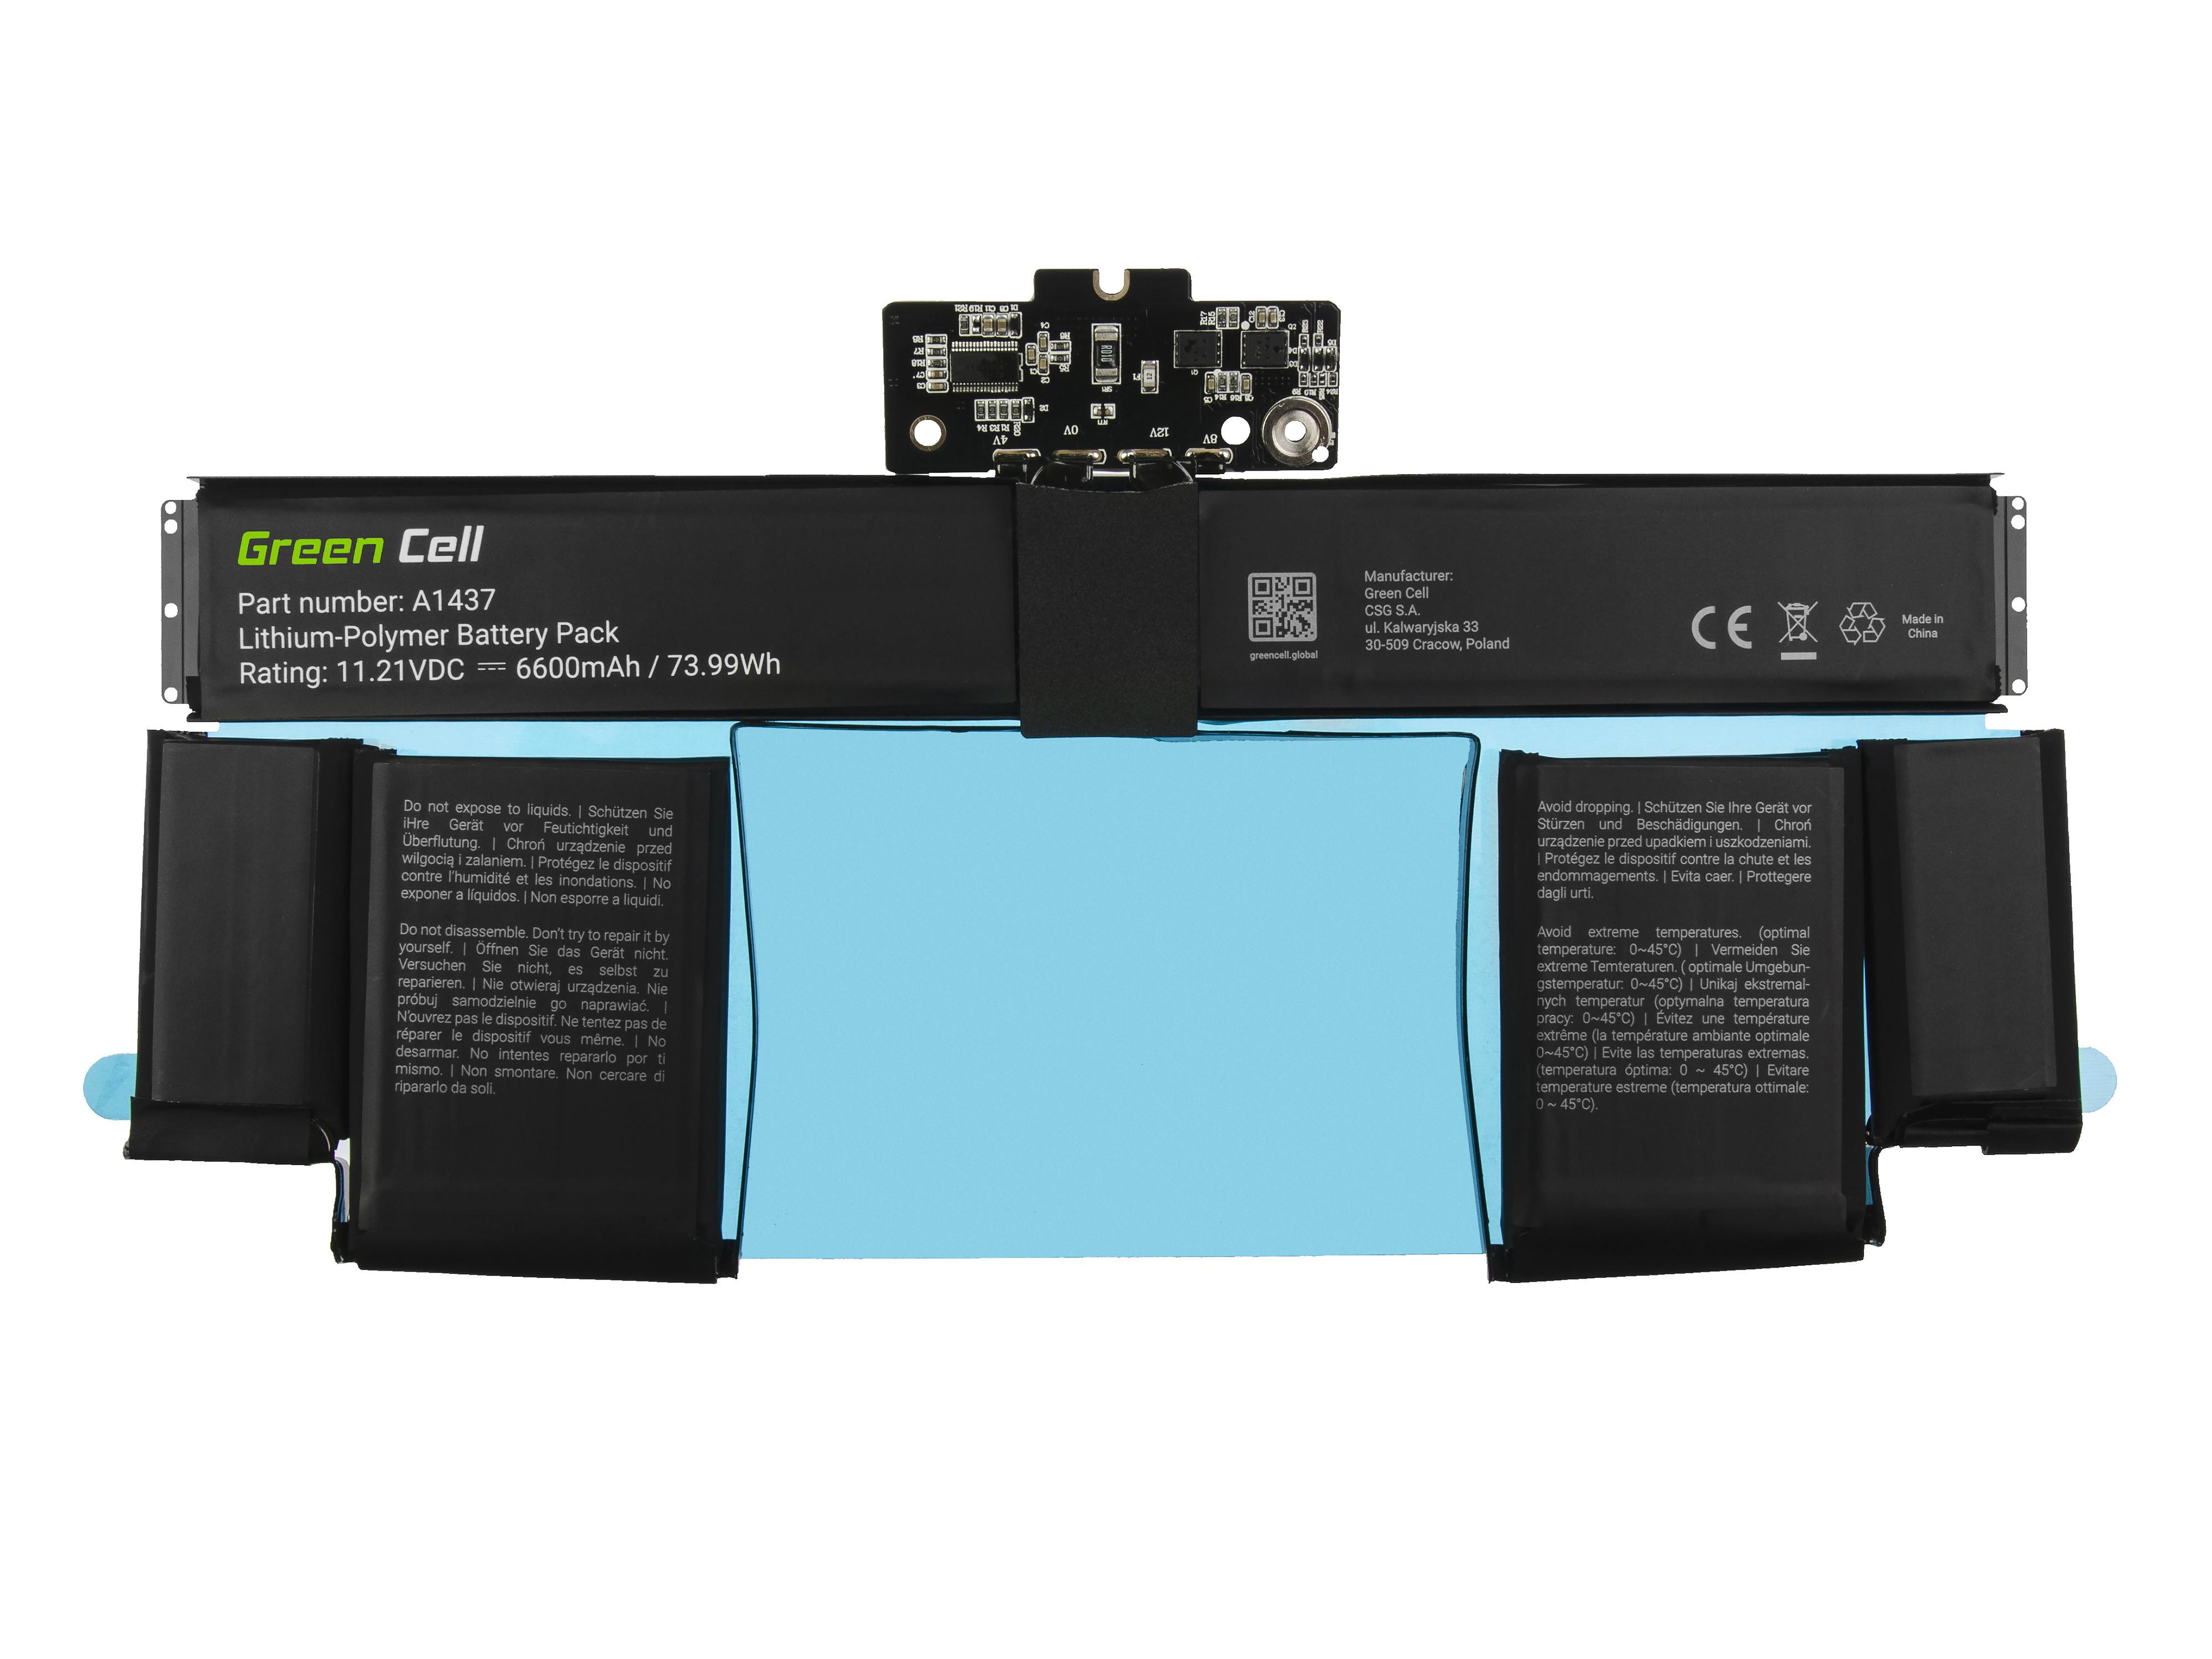 Green Cell AP16 Baterie Apple A1437, Apple MacBook Pro 13 A1425 (Late 2012, Early 2013) 74Wh Li-Pol – neoriginální